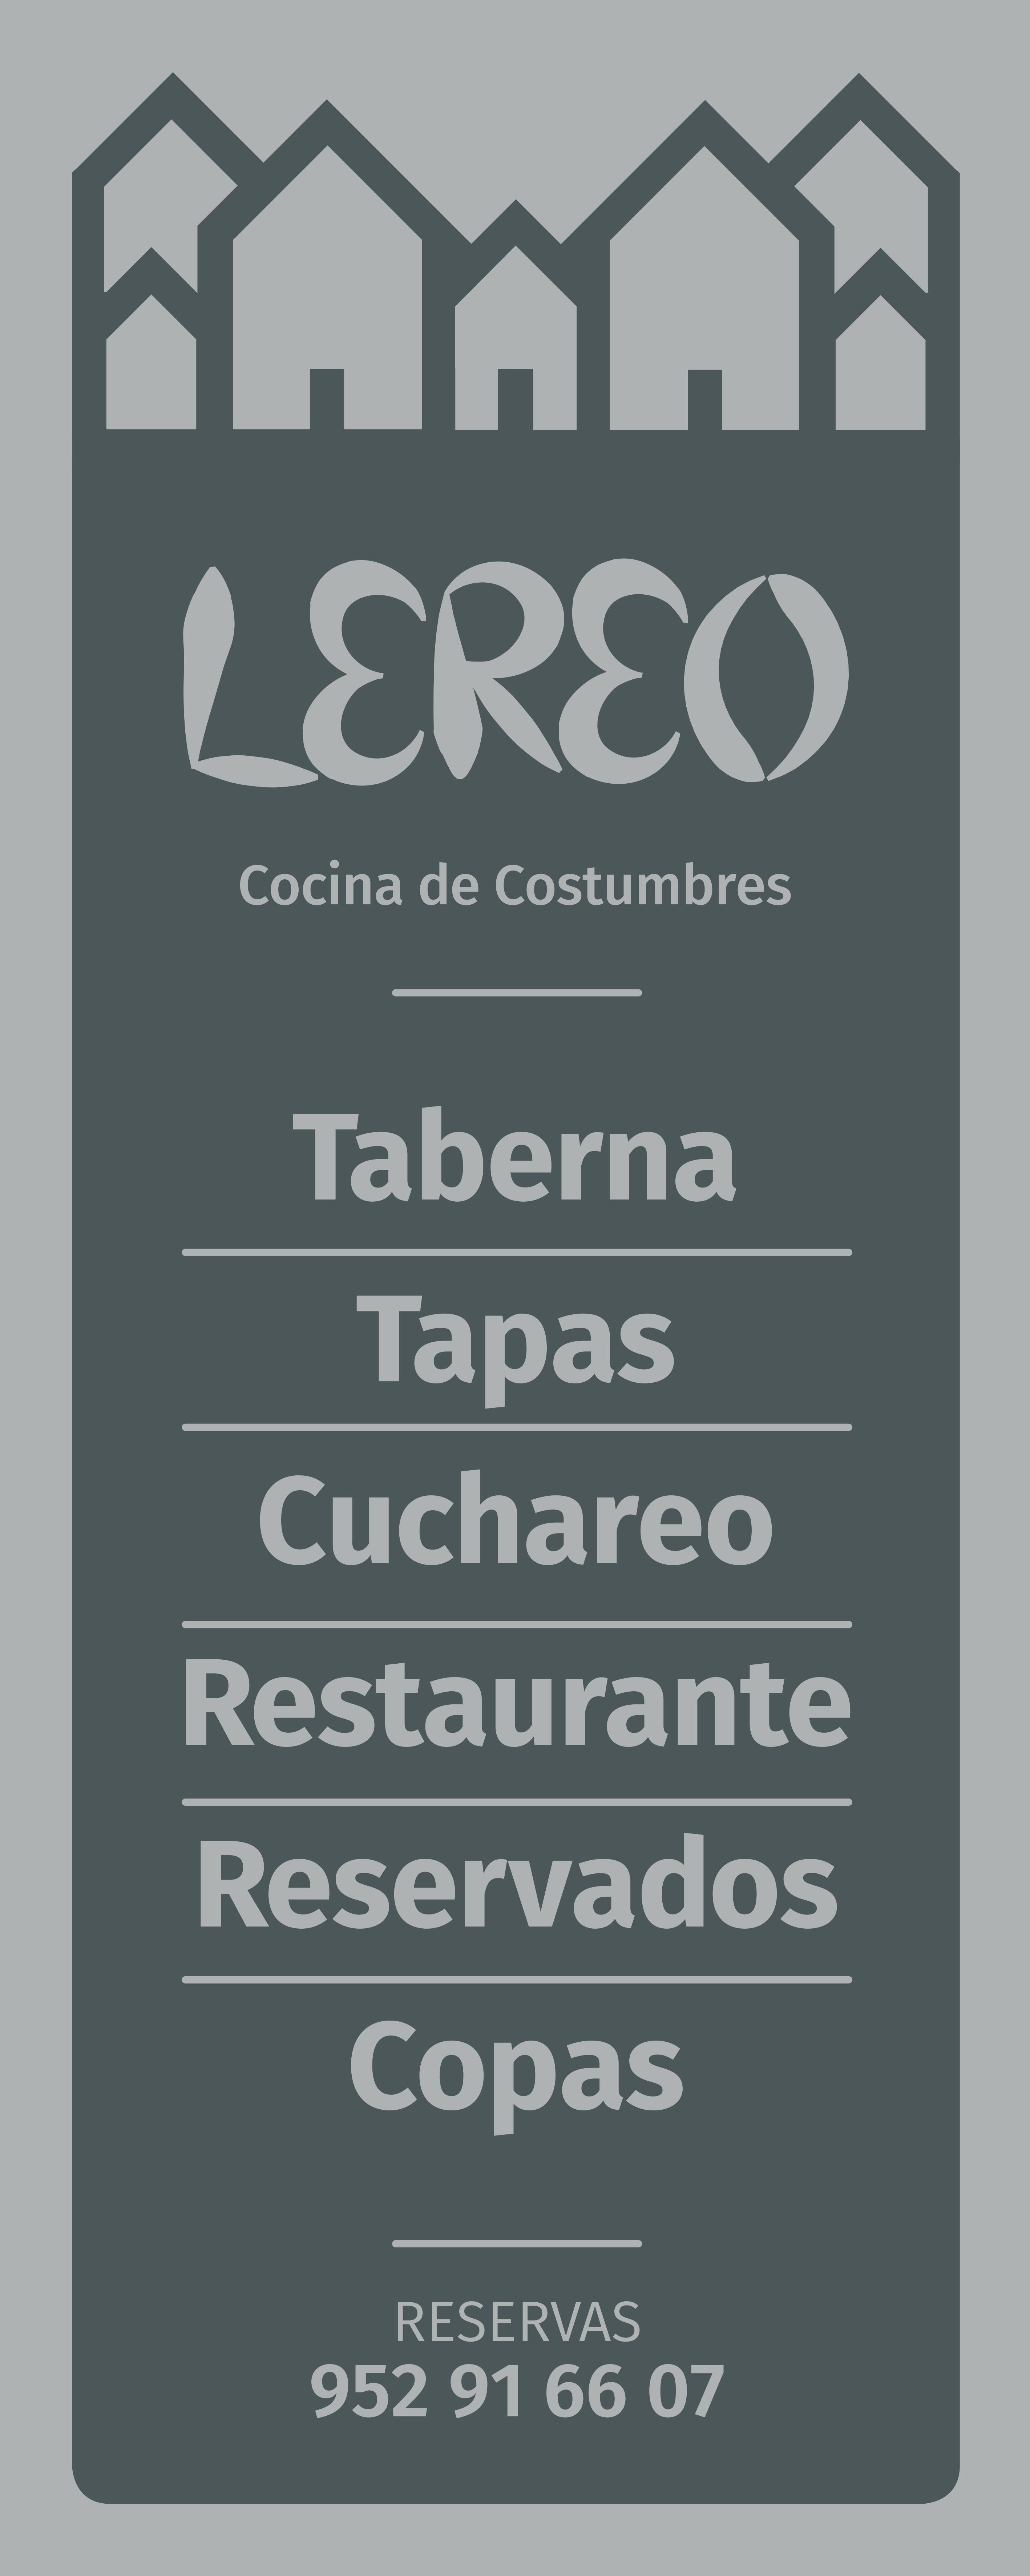 Restaurante Lereo